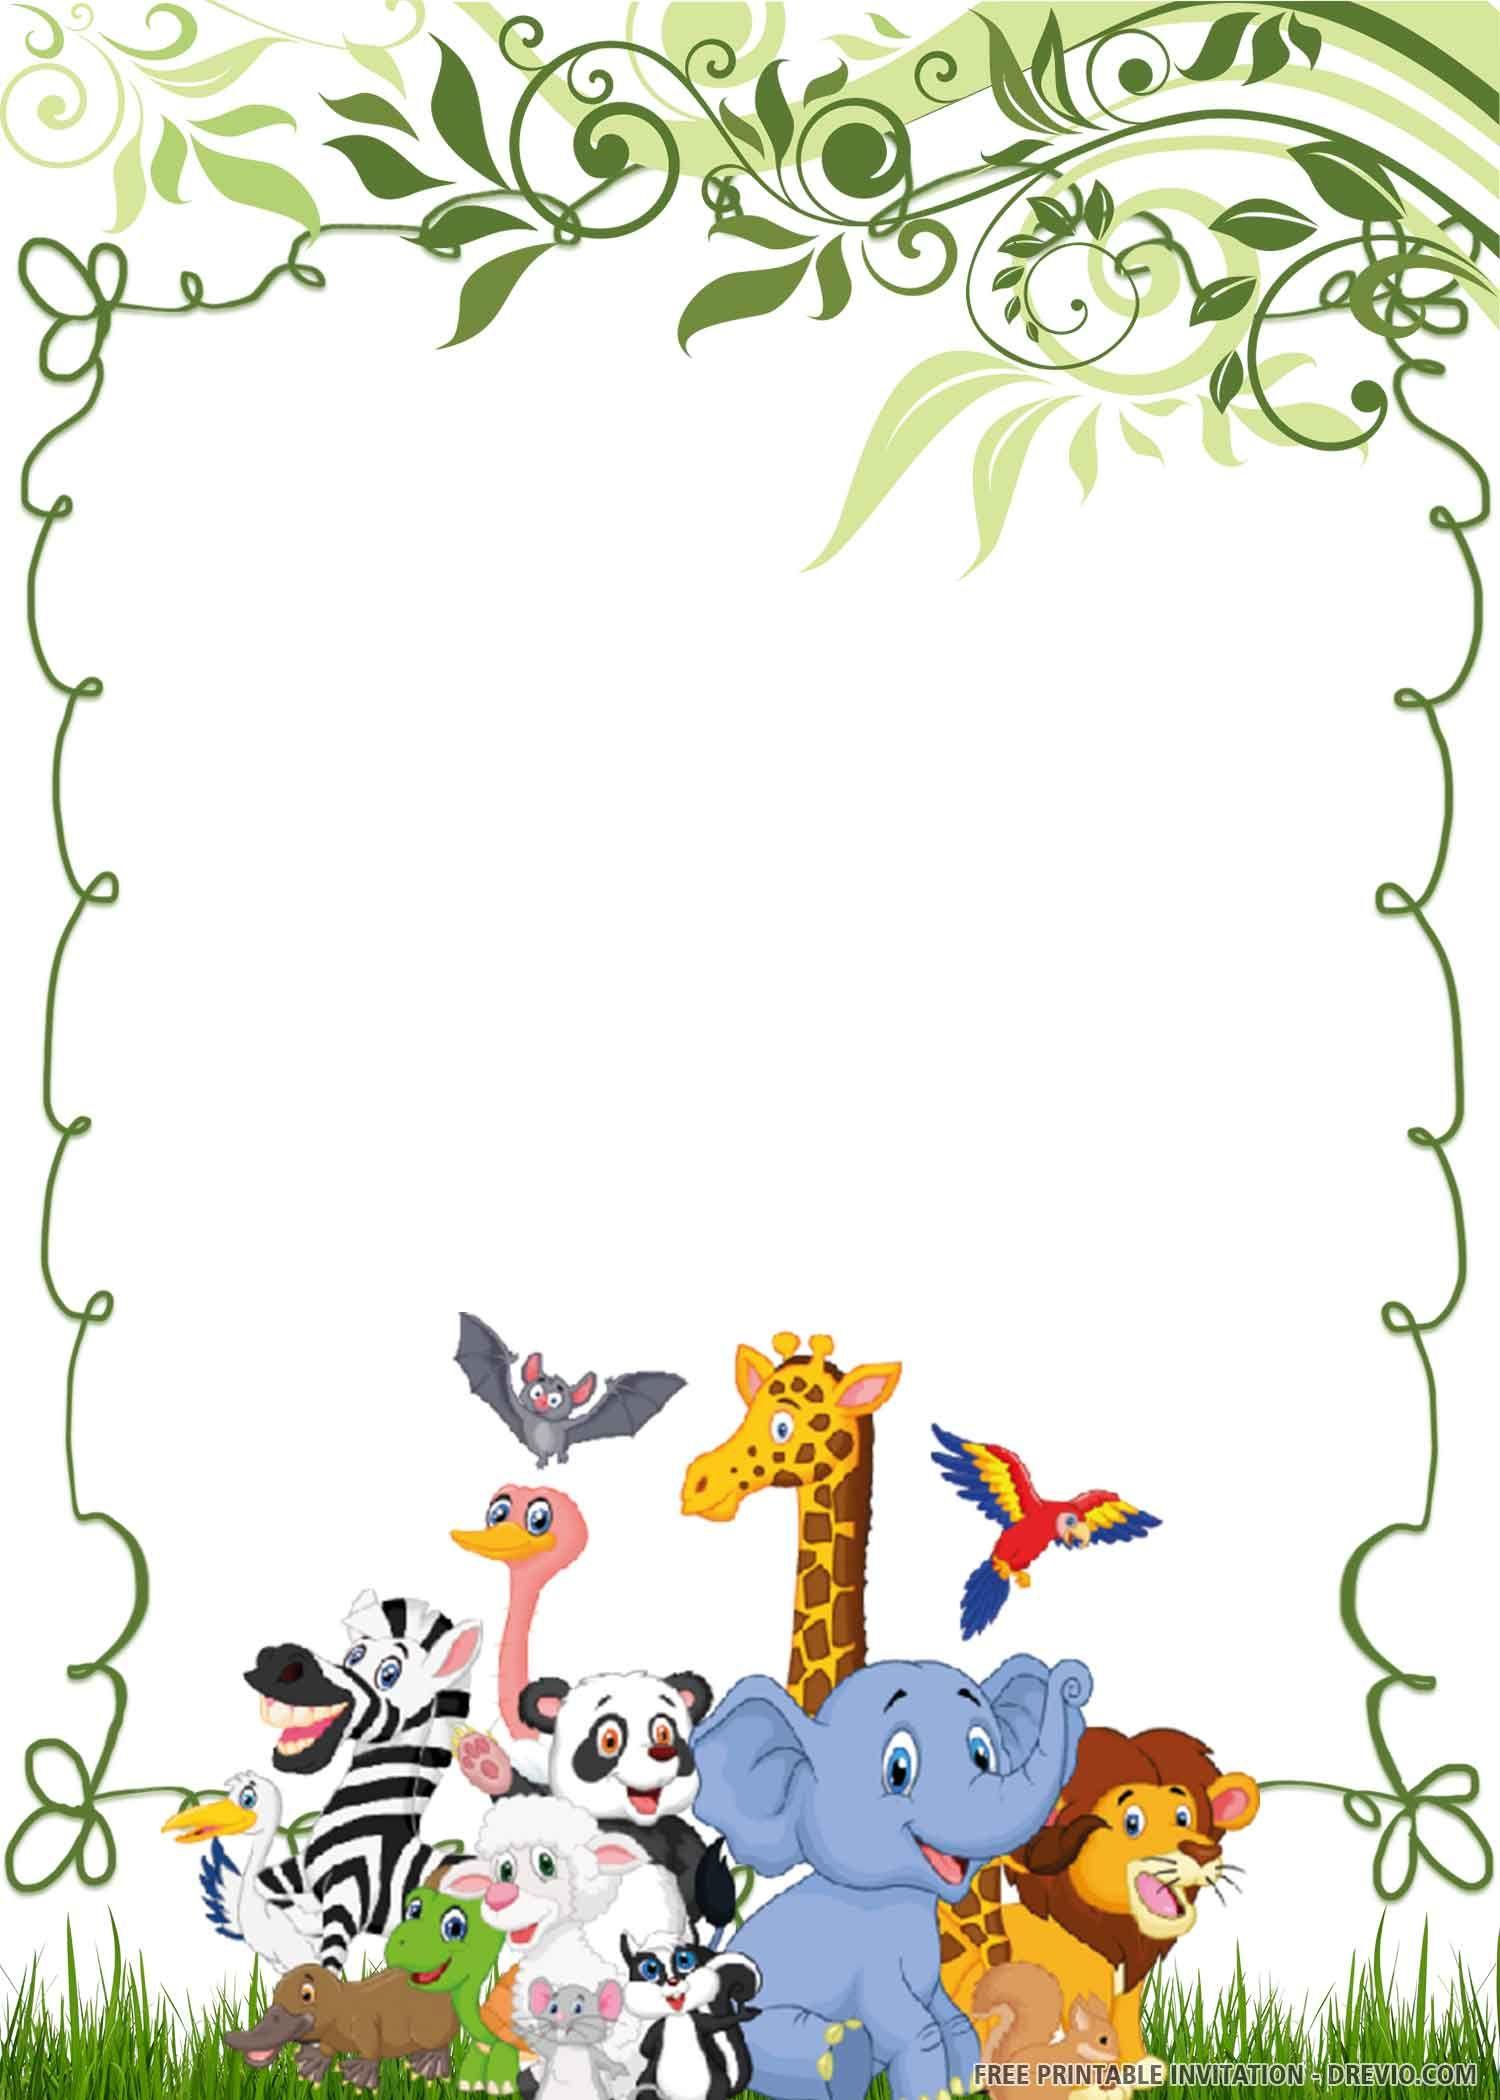 Free Printable Wild One Birthday Invitation Templates Kartu Ulang Tahun Kartu Ulang Tahun